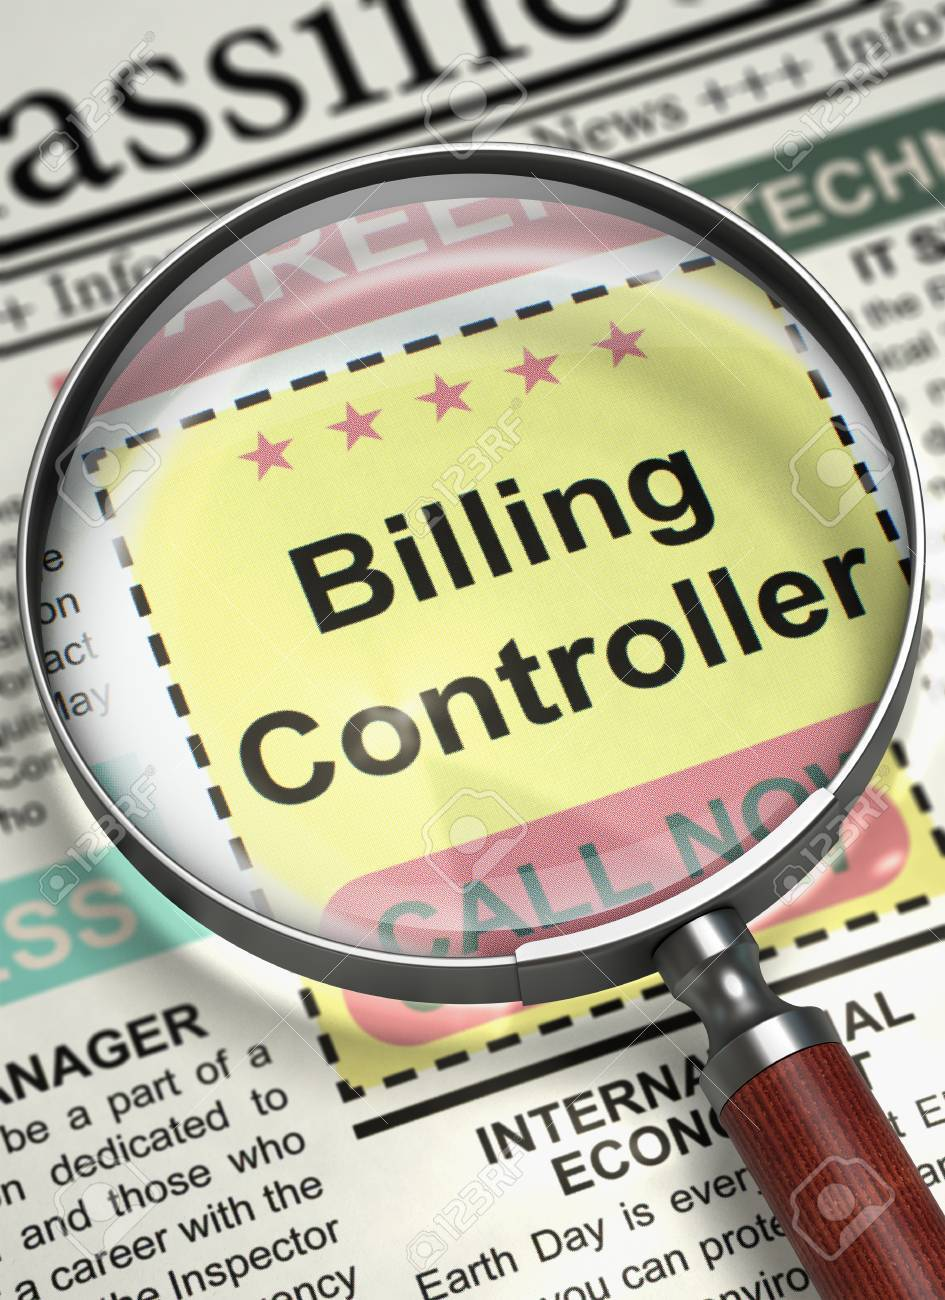 newspaper jobs billing controller billing controller newspaper jobs billing controller billing controller vacancy in newspaper job seeking concept